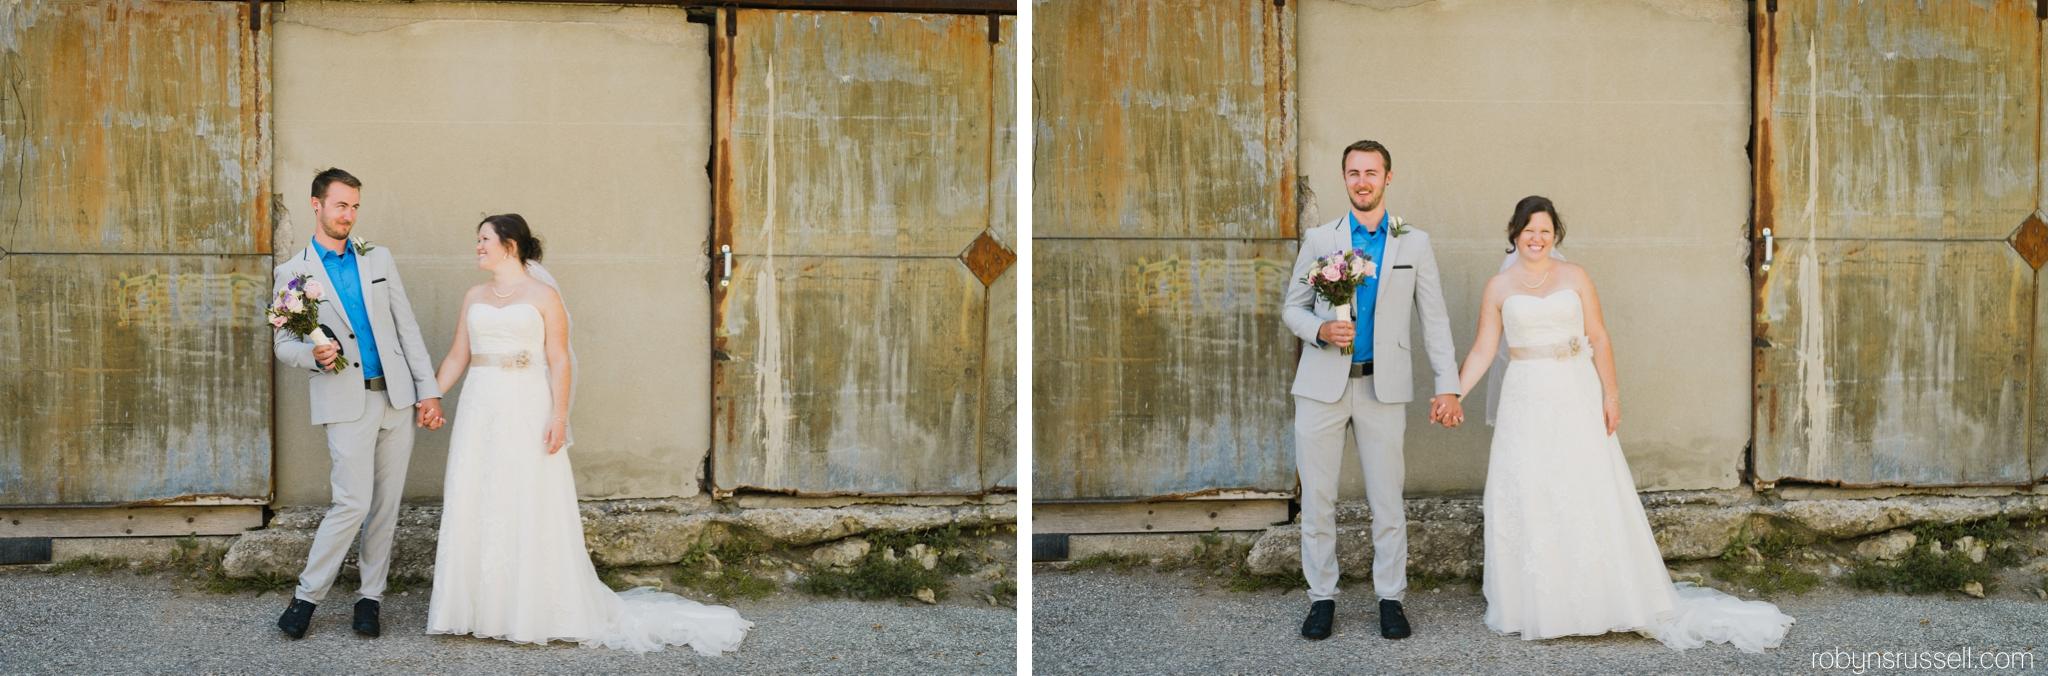 41-more-sweet-moments-between-bride-and-groom.jpg